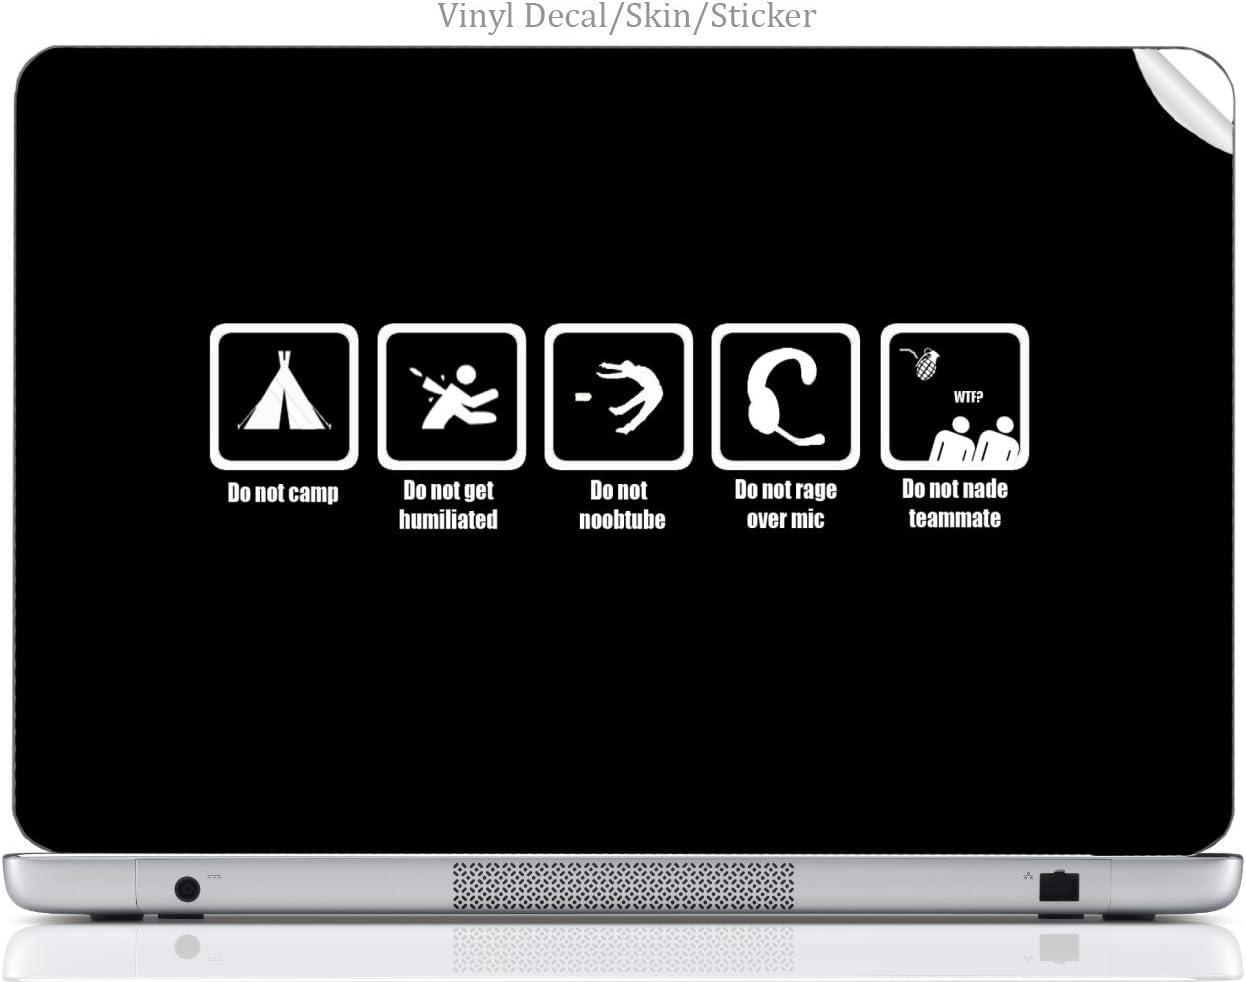 Laptop VINYL DECAL Sticker Skin Print Gentlemen's Guide To Online Gaming Art fits Ativ Book 9 (15.6in, 2014)